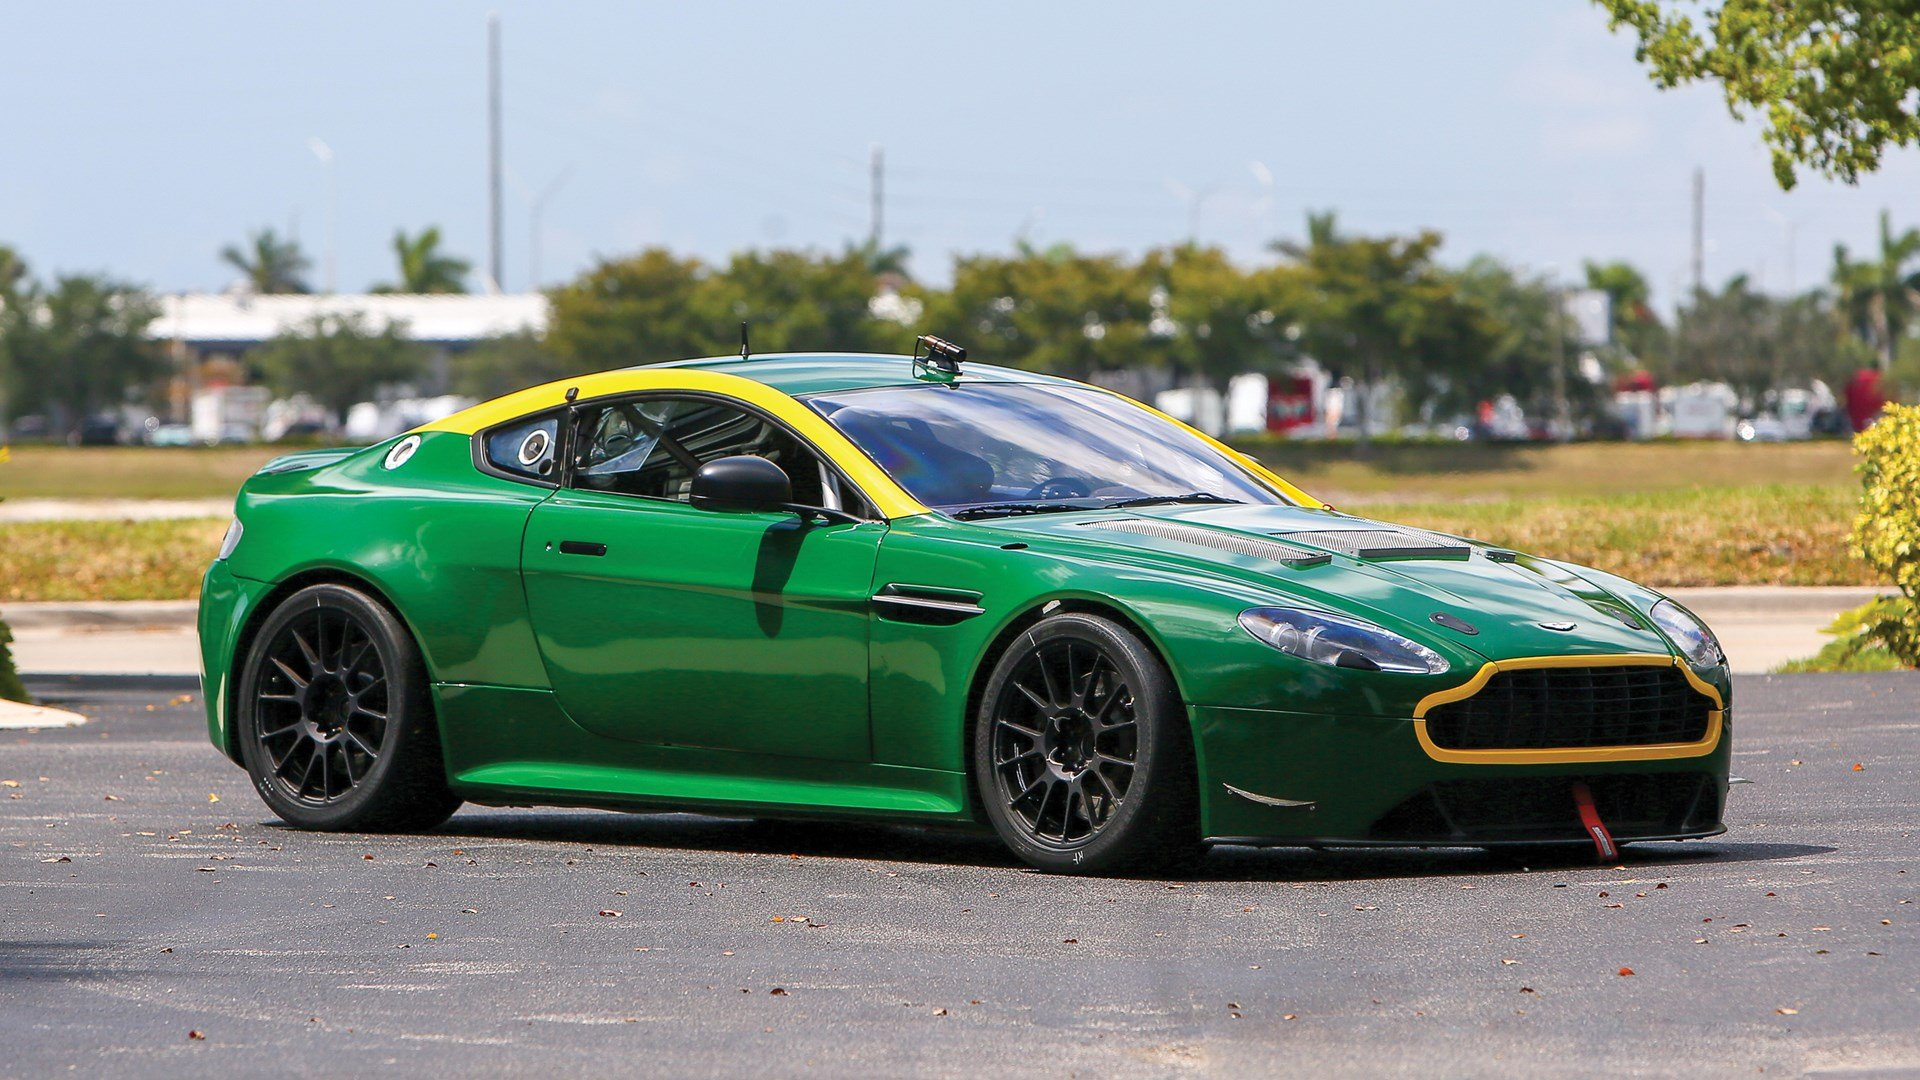 2010 Aston Martin V8 Vantage Gt4 Classic Driver Market